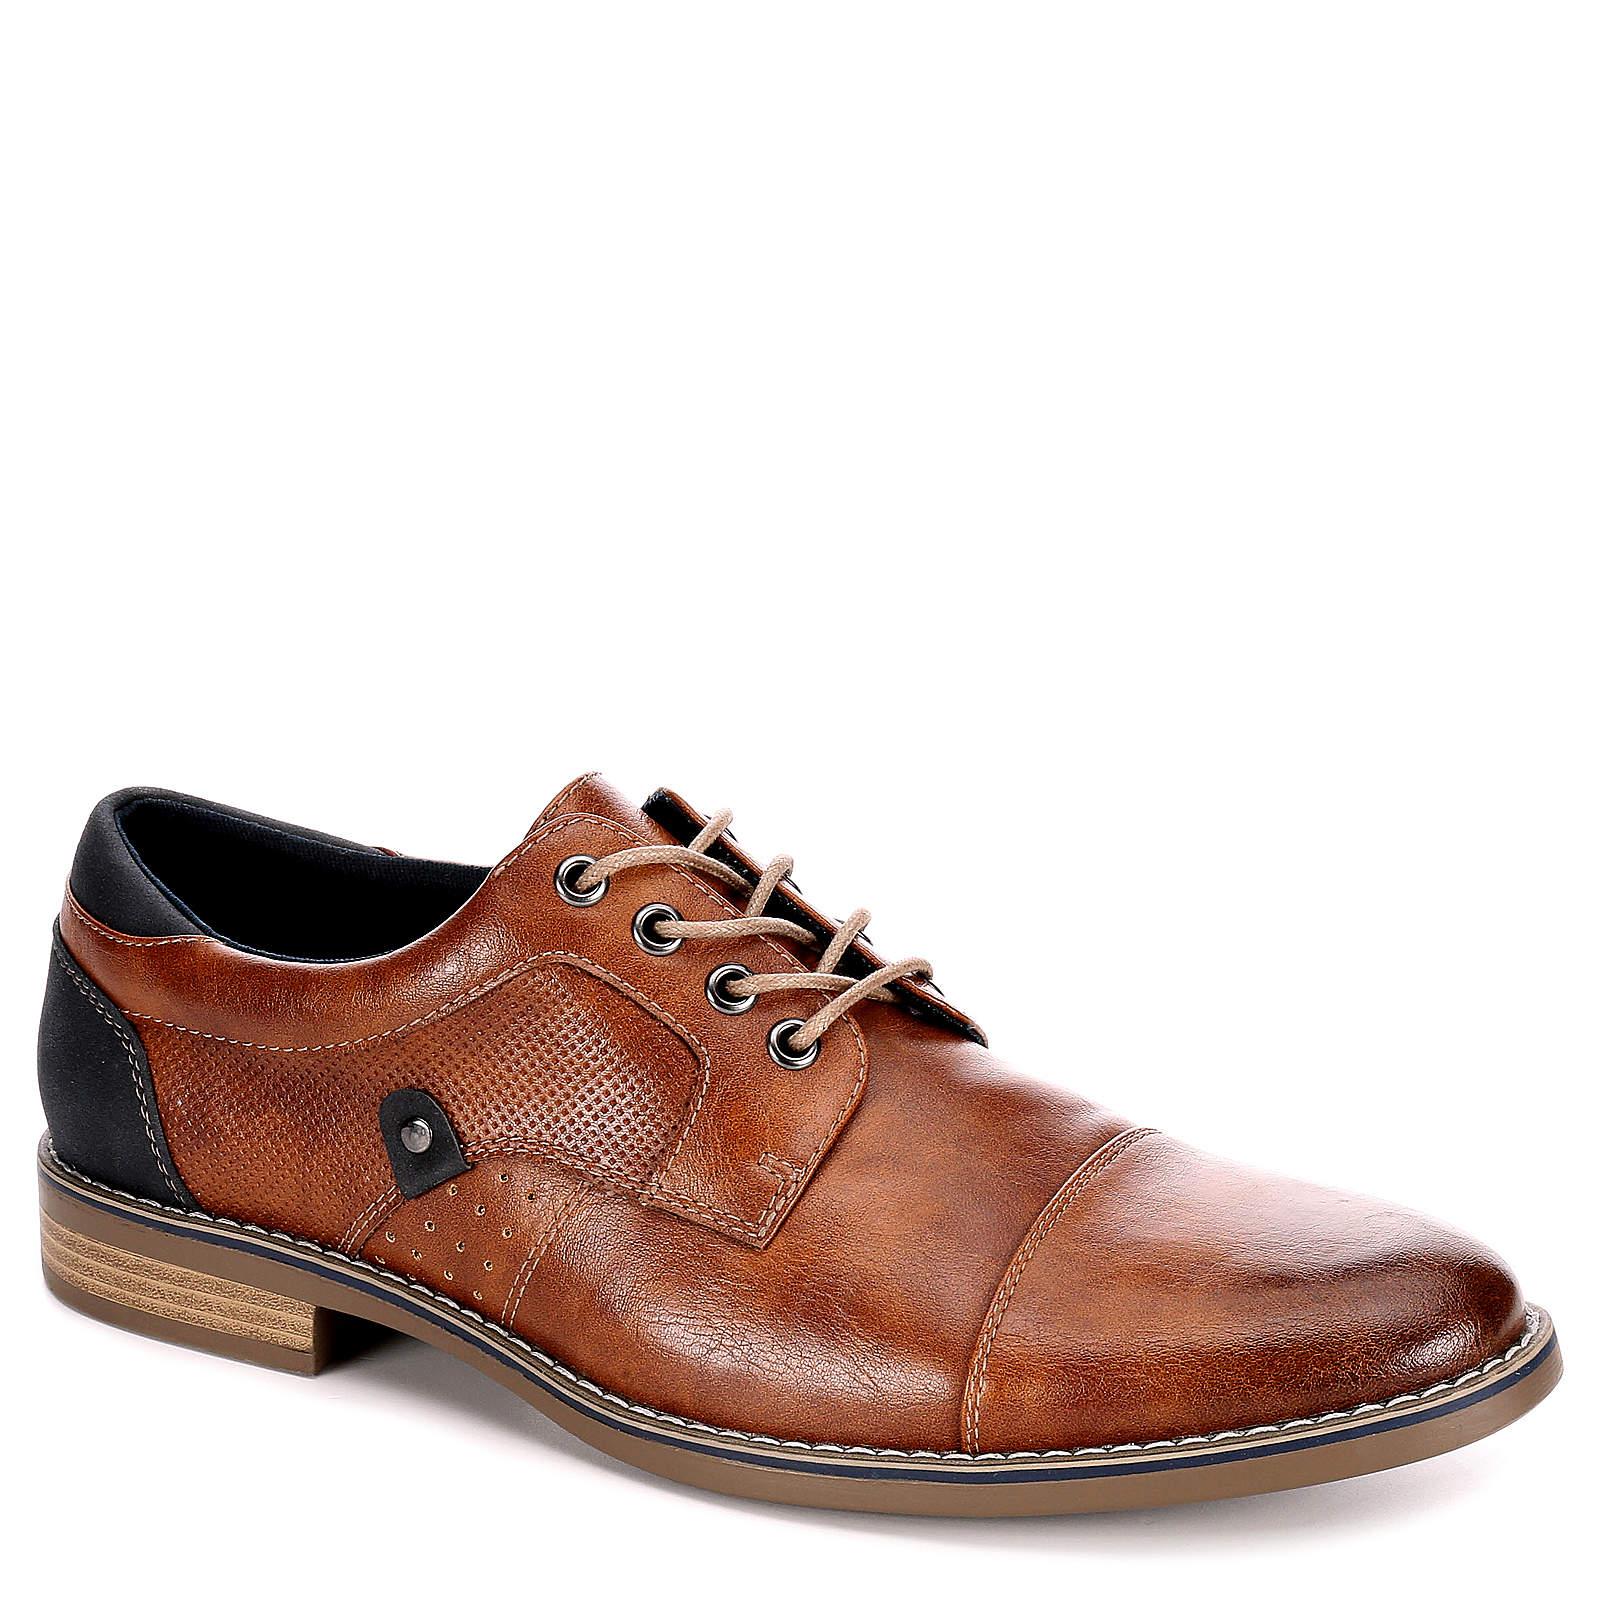 Restoration Mens Justin Lace Up Cap Toe Oxford Shoes Cognac